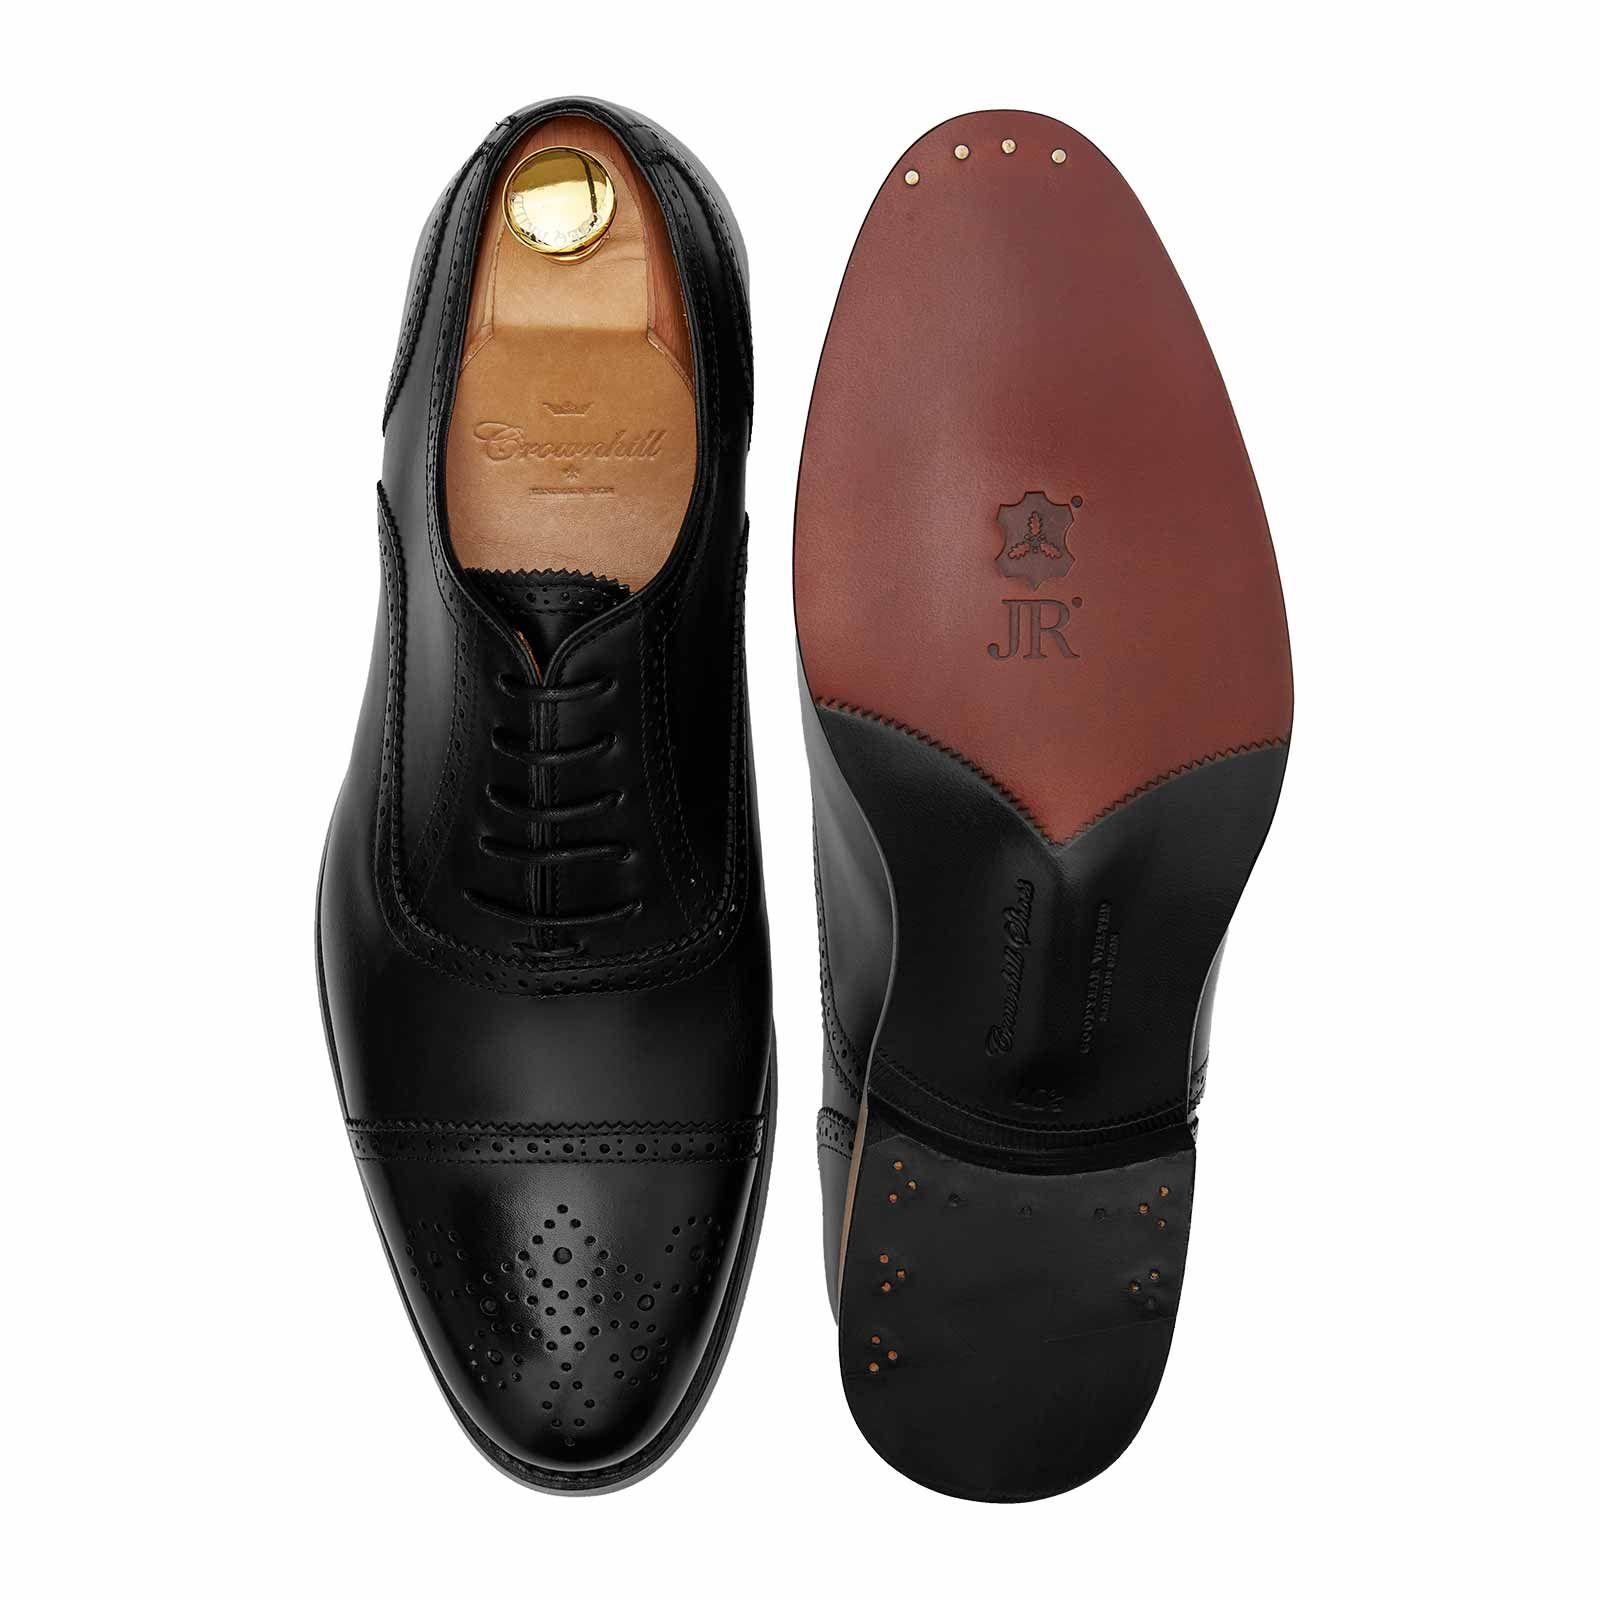 clarks black oxford shoes